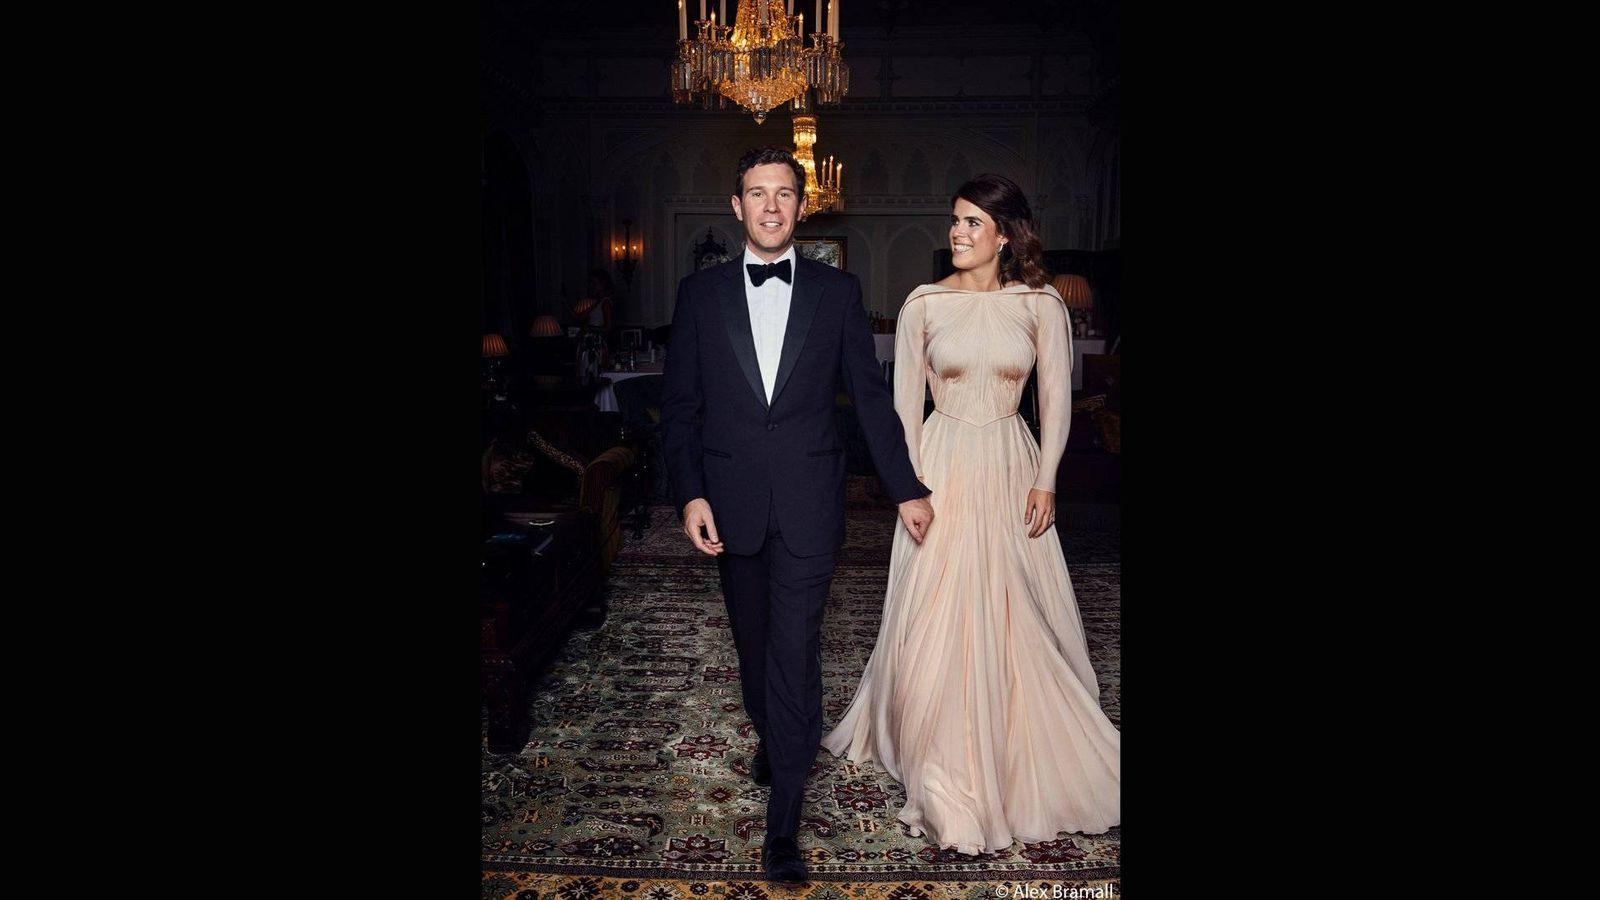 Foto: La pareja en la fiesta posterior a la ceremonia. (Alex Bramall)